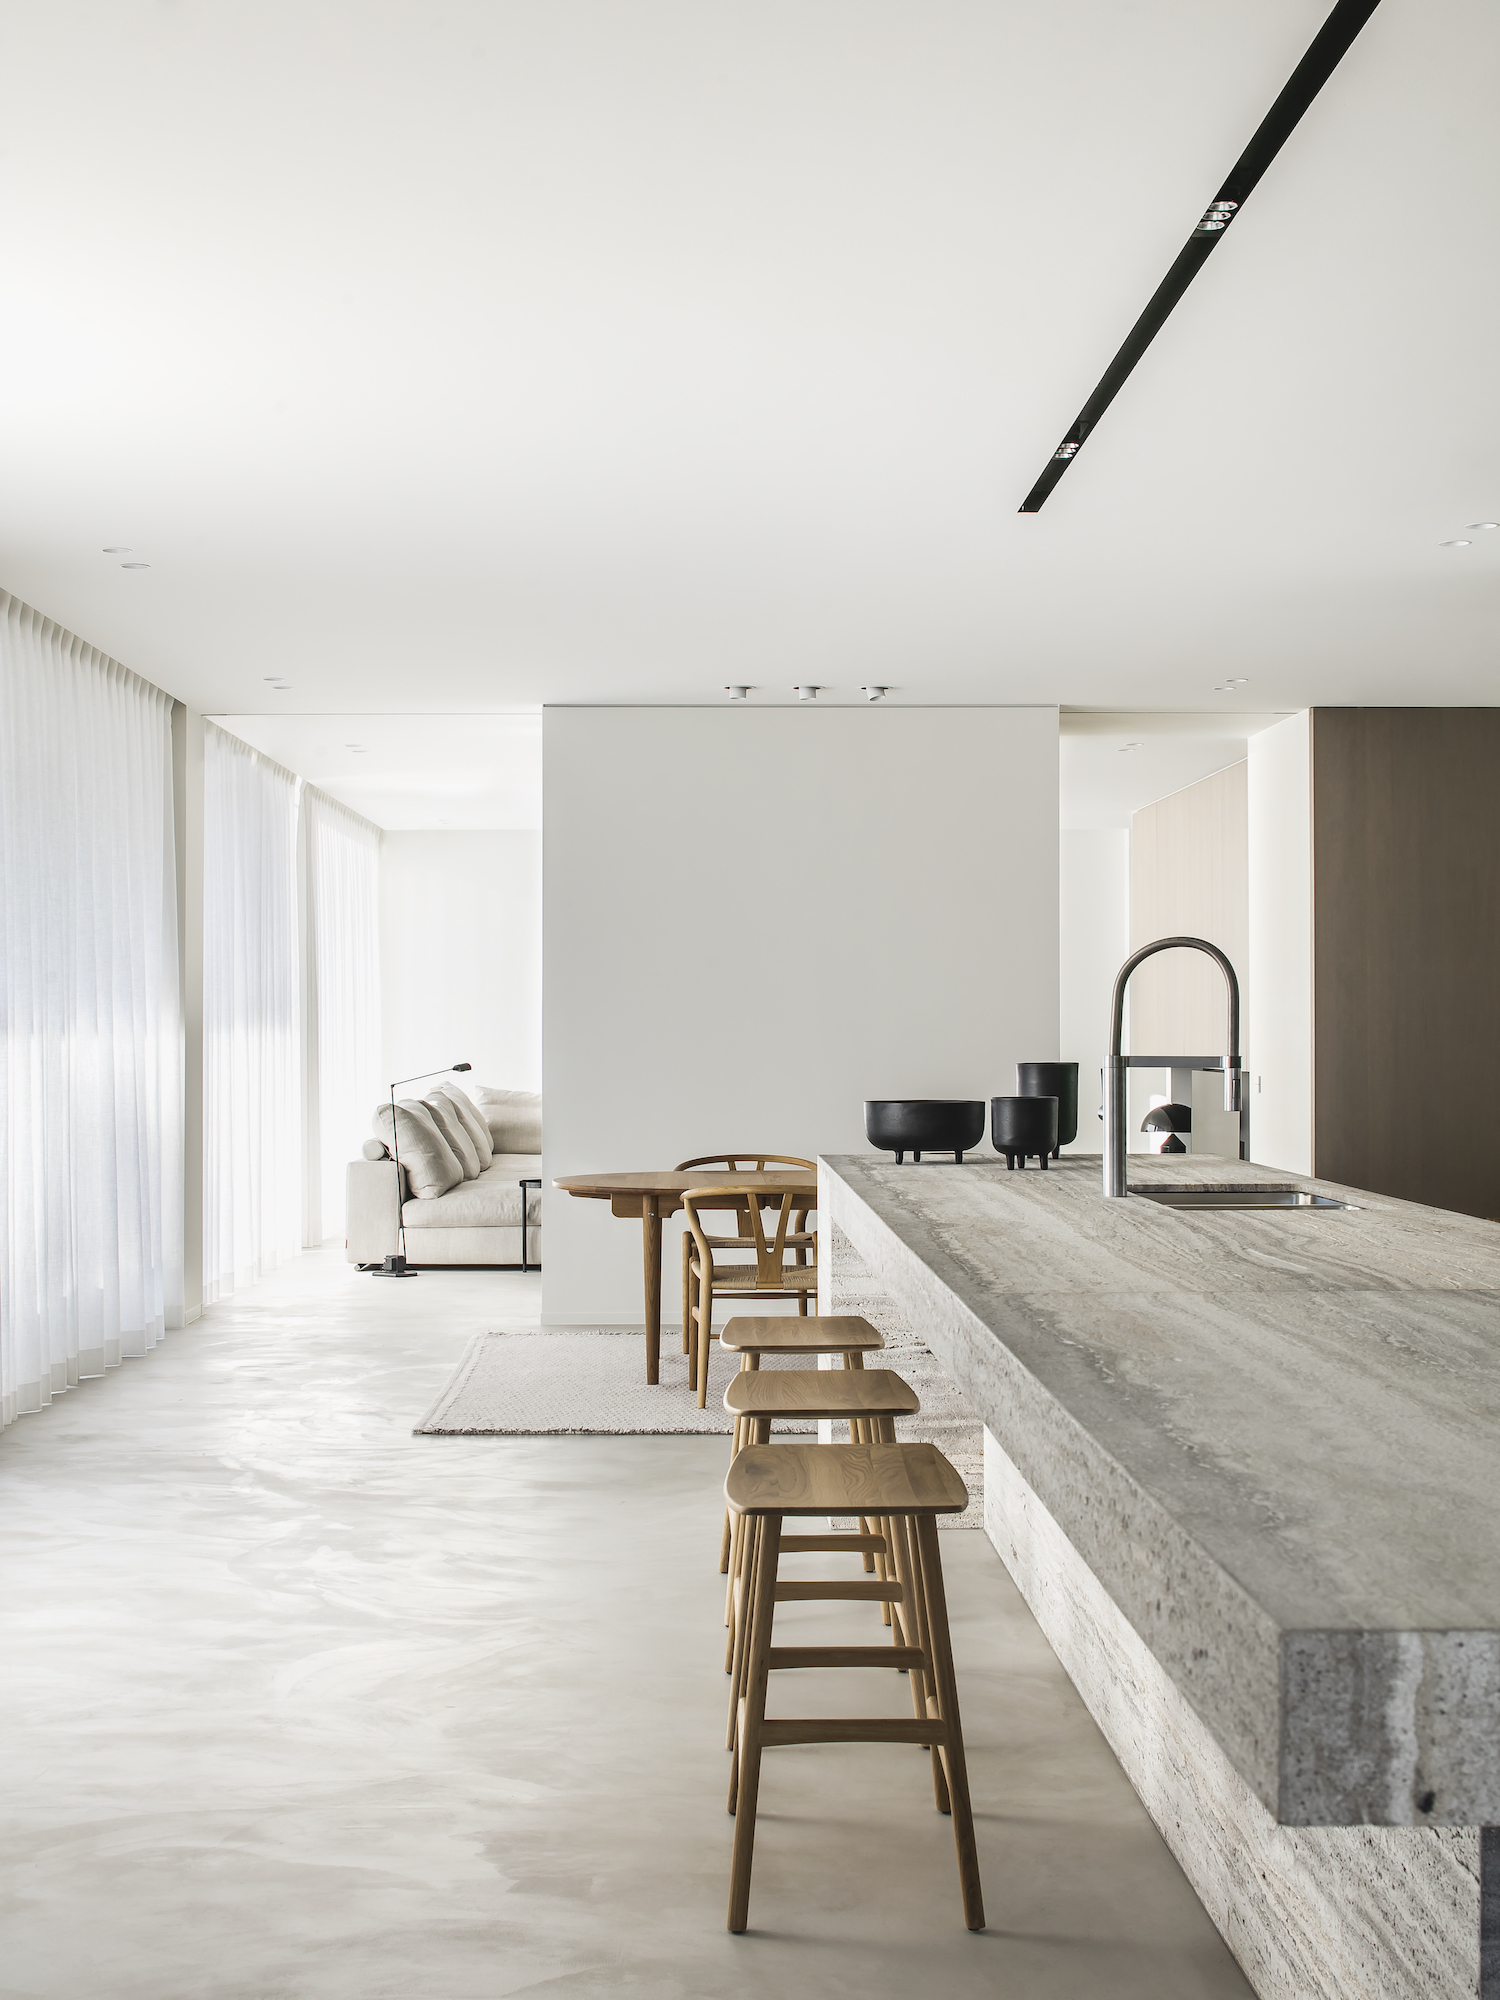 est living boe 2019 international designers pieter vanrenterghem 01